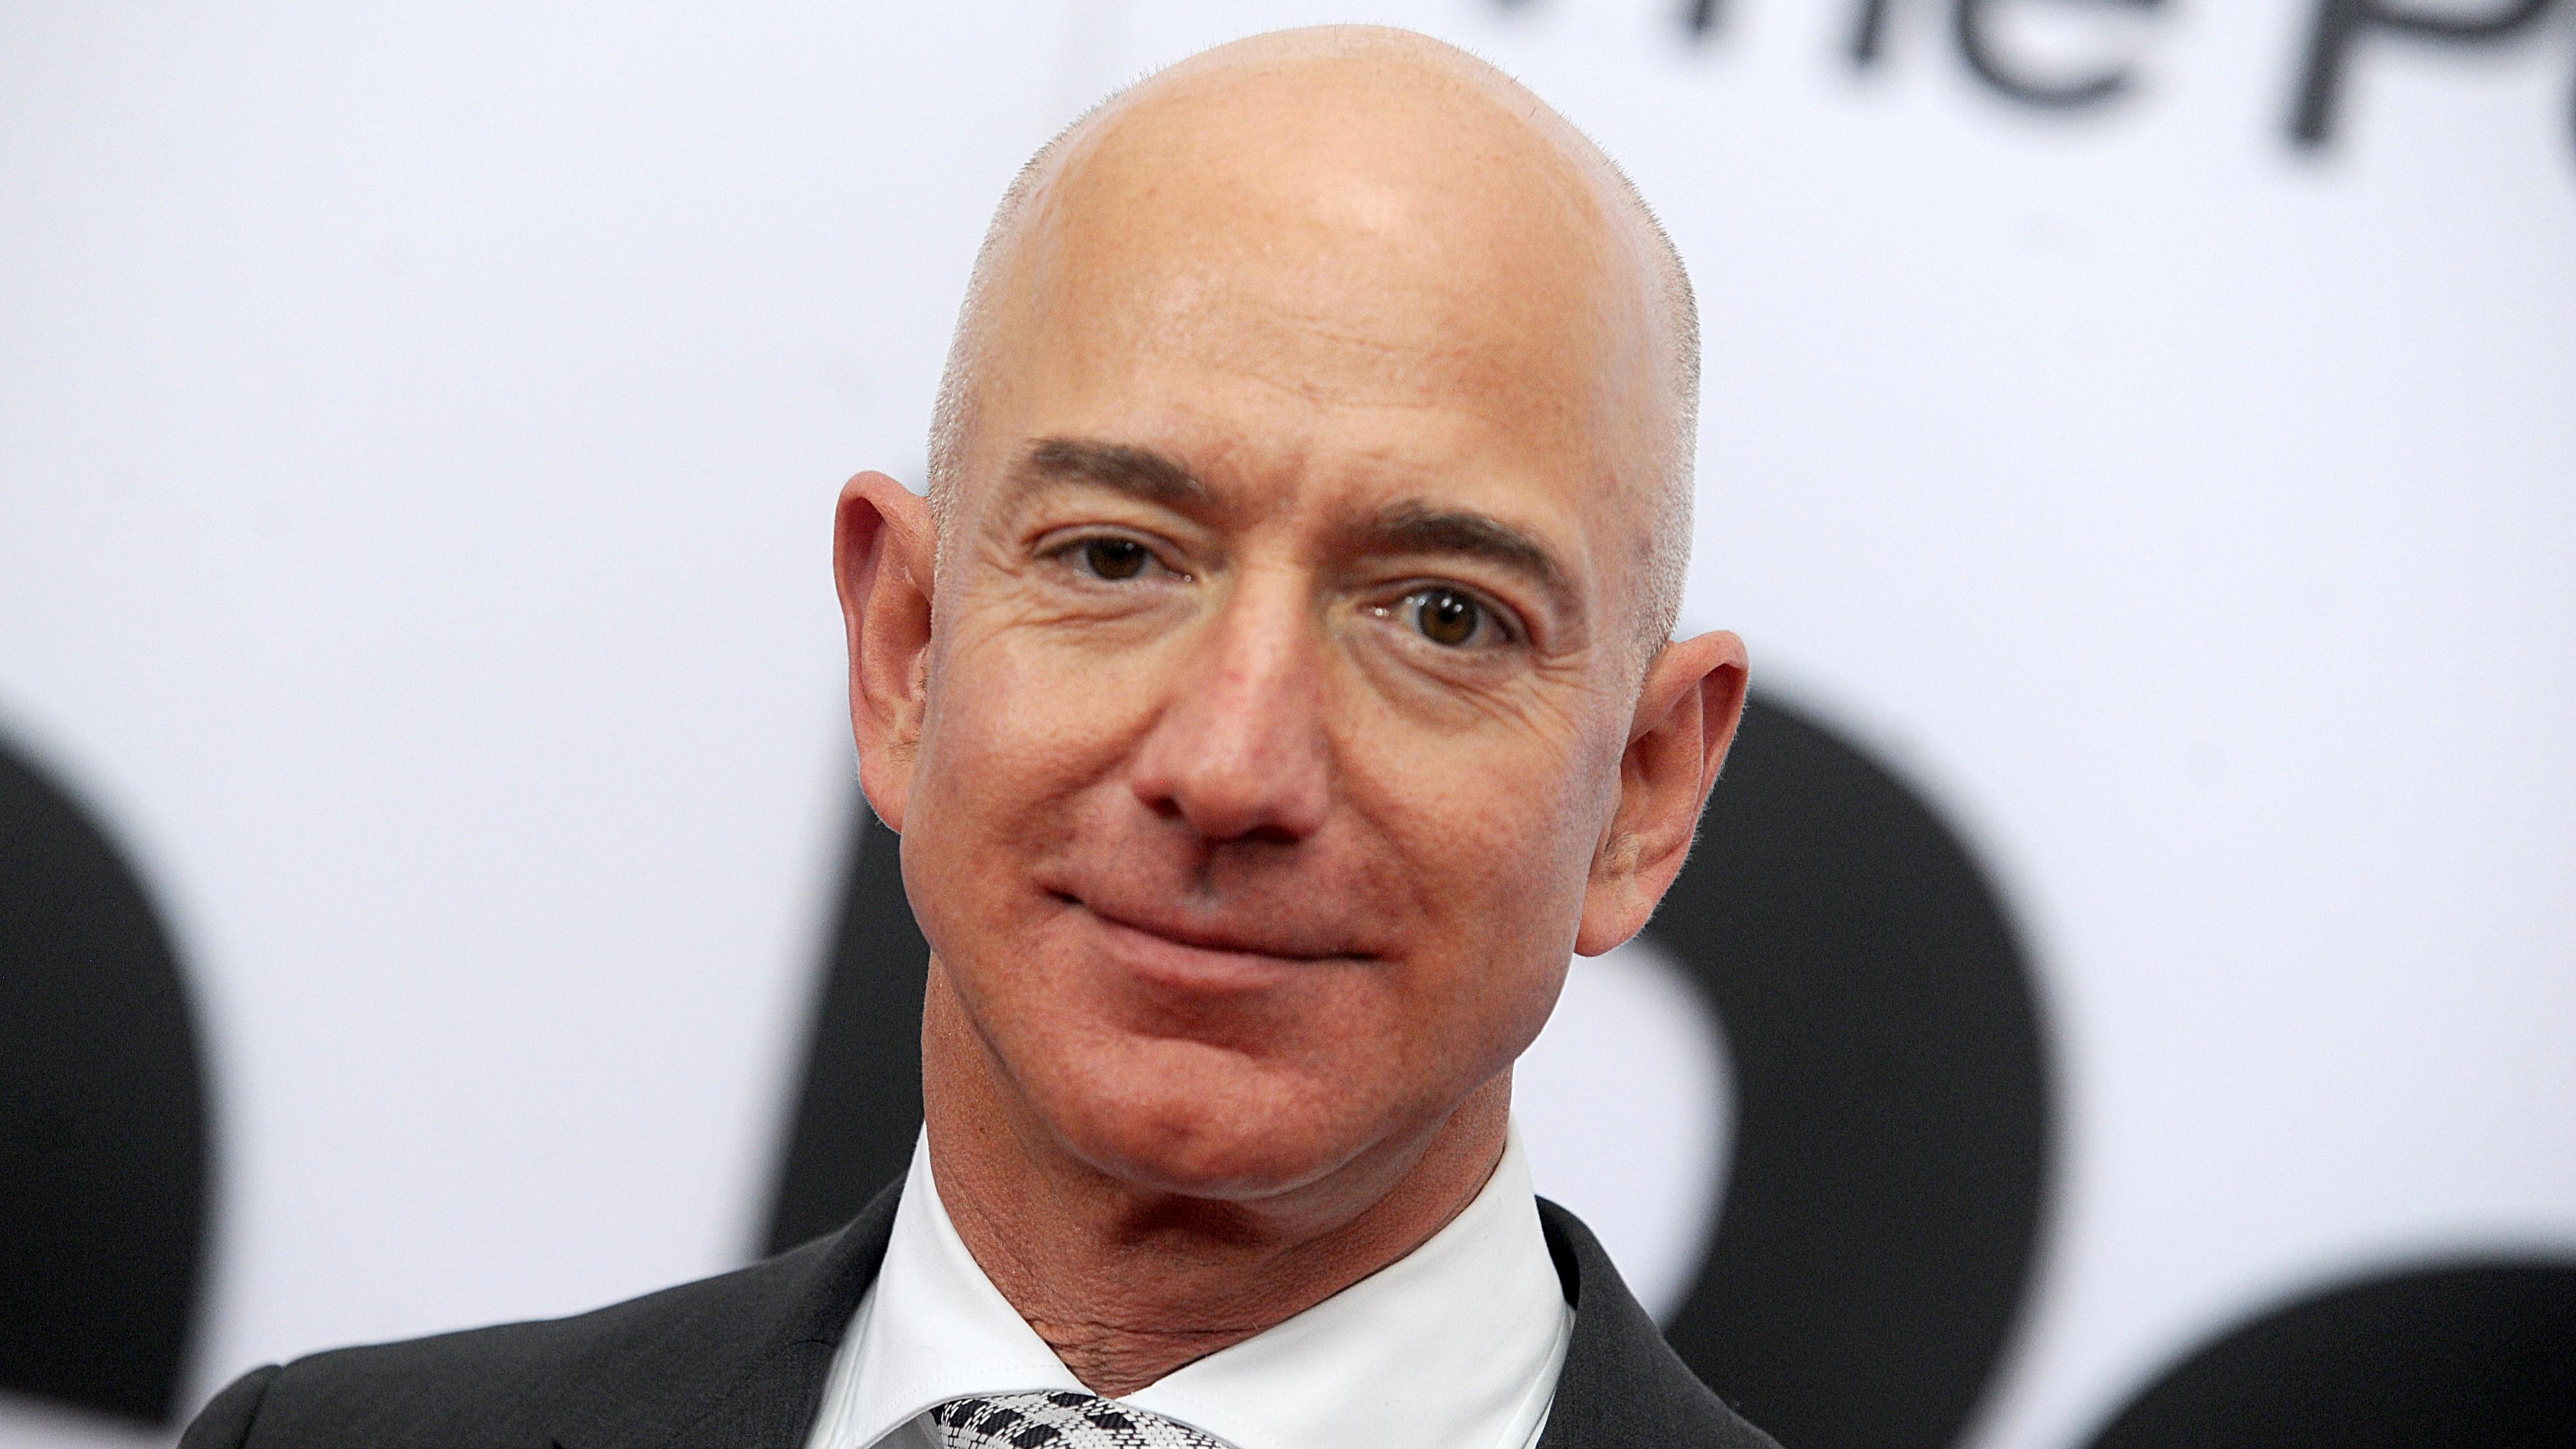 Amazon CEO Jeff Bezos Donates $33 Million To Fund For Undocumented US Students